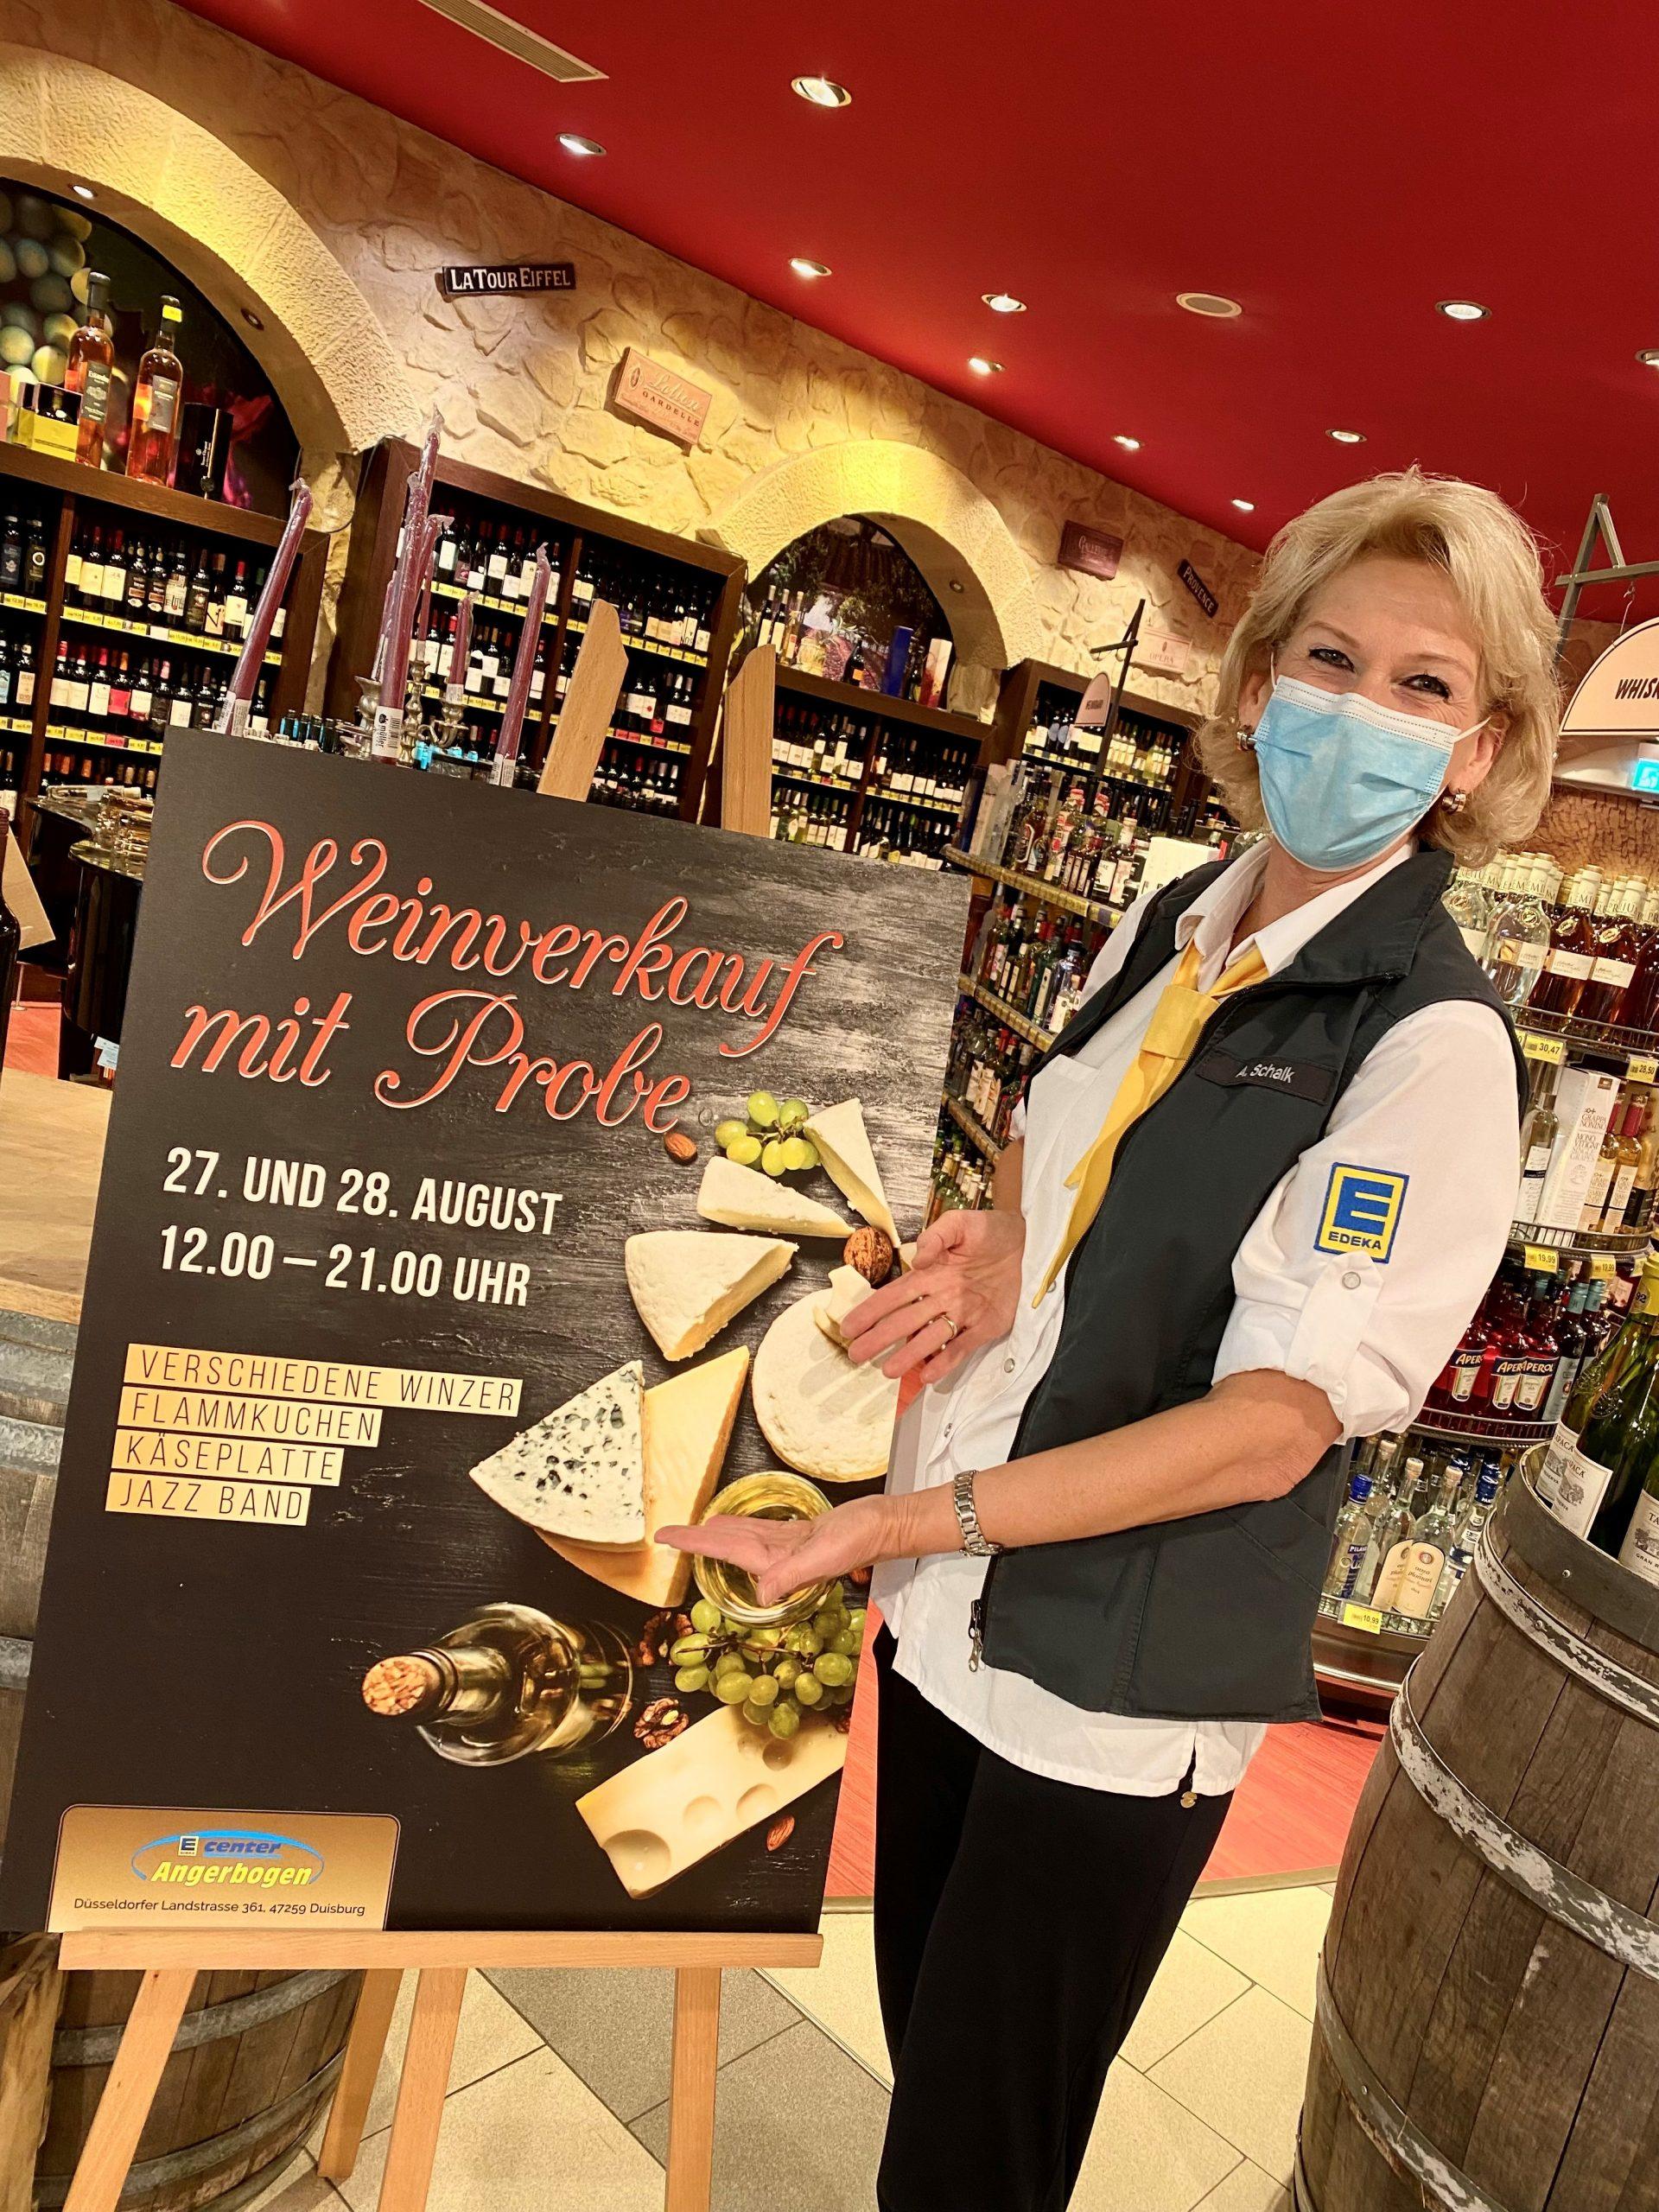 Read more about the article Weinverkauf mit Probe 27./28.08.2021